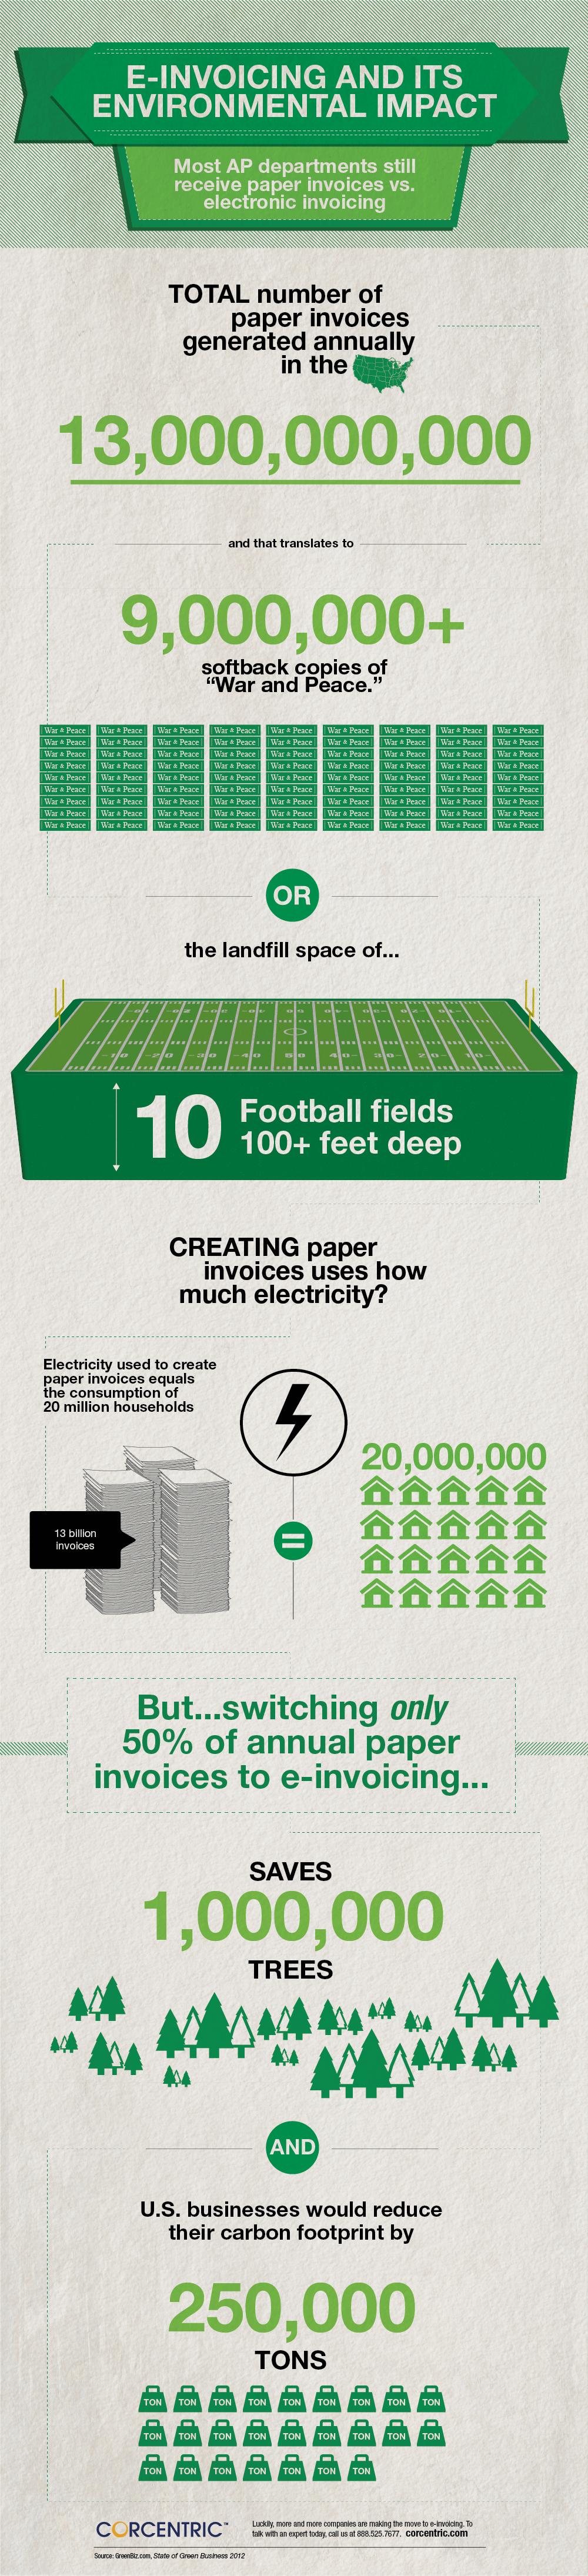 Corcentric E-Invoicing Infographic